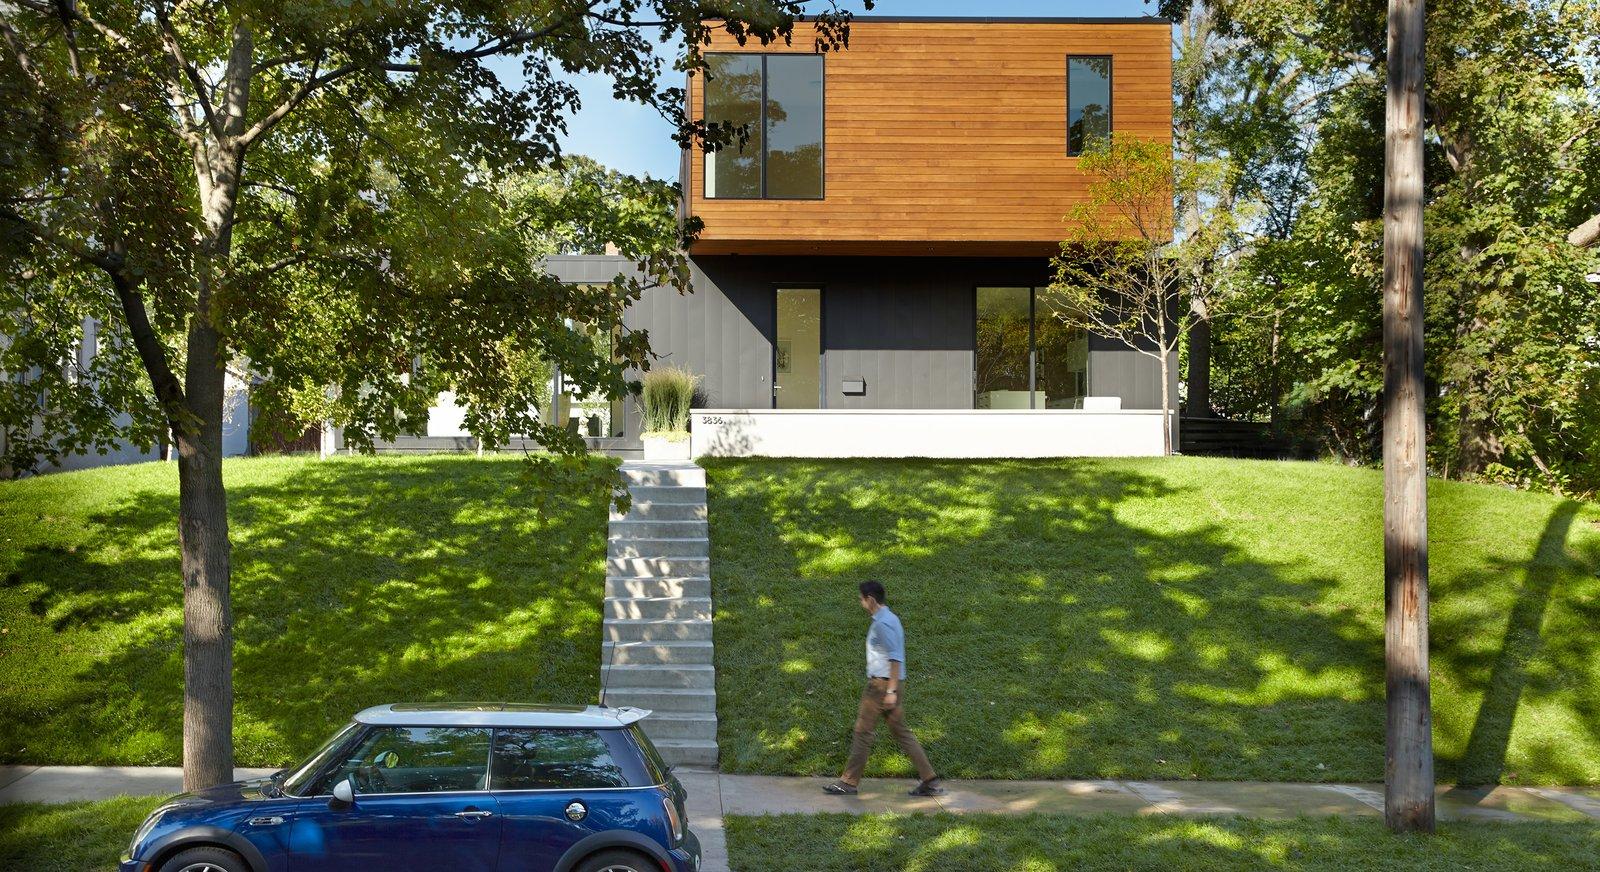 Outdoor, Metal Patio, Porch, Deck, Grass, Front Yard, Trees, Concrete Patio, Porch, Deck, and Wood Patio, Porch, Deck  Sheridan Residence by Peterssen/Keller Architecture